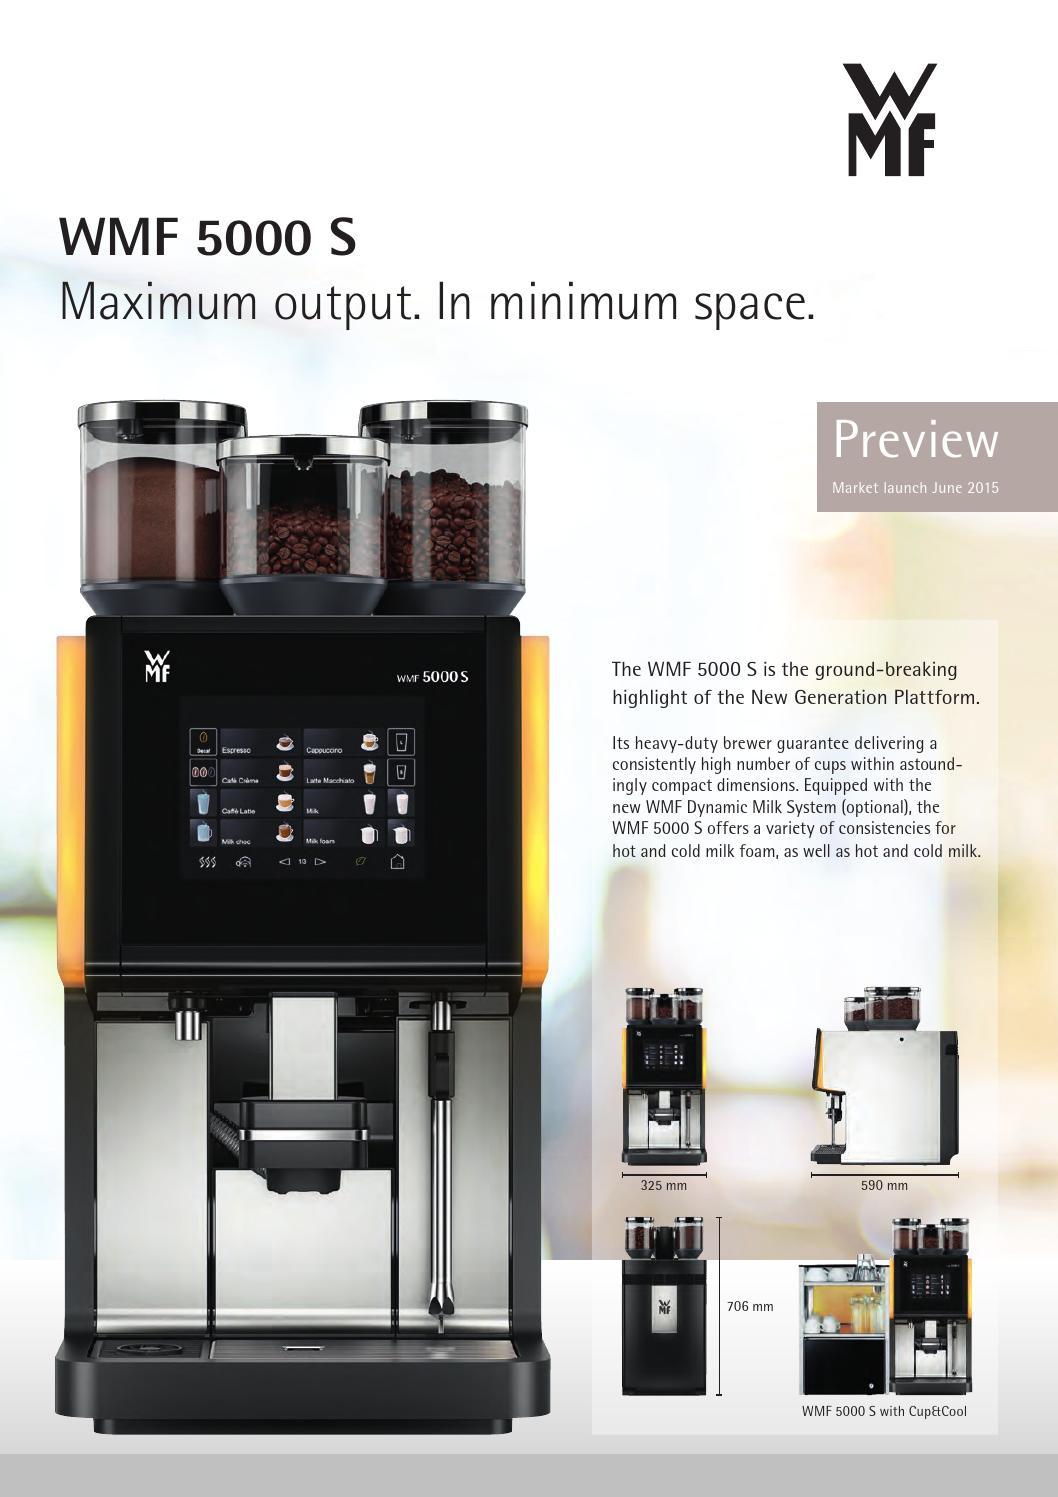 2015 Wmf 5000 S Flyer Gb By Sarafidisgroup Sarafidisgroup